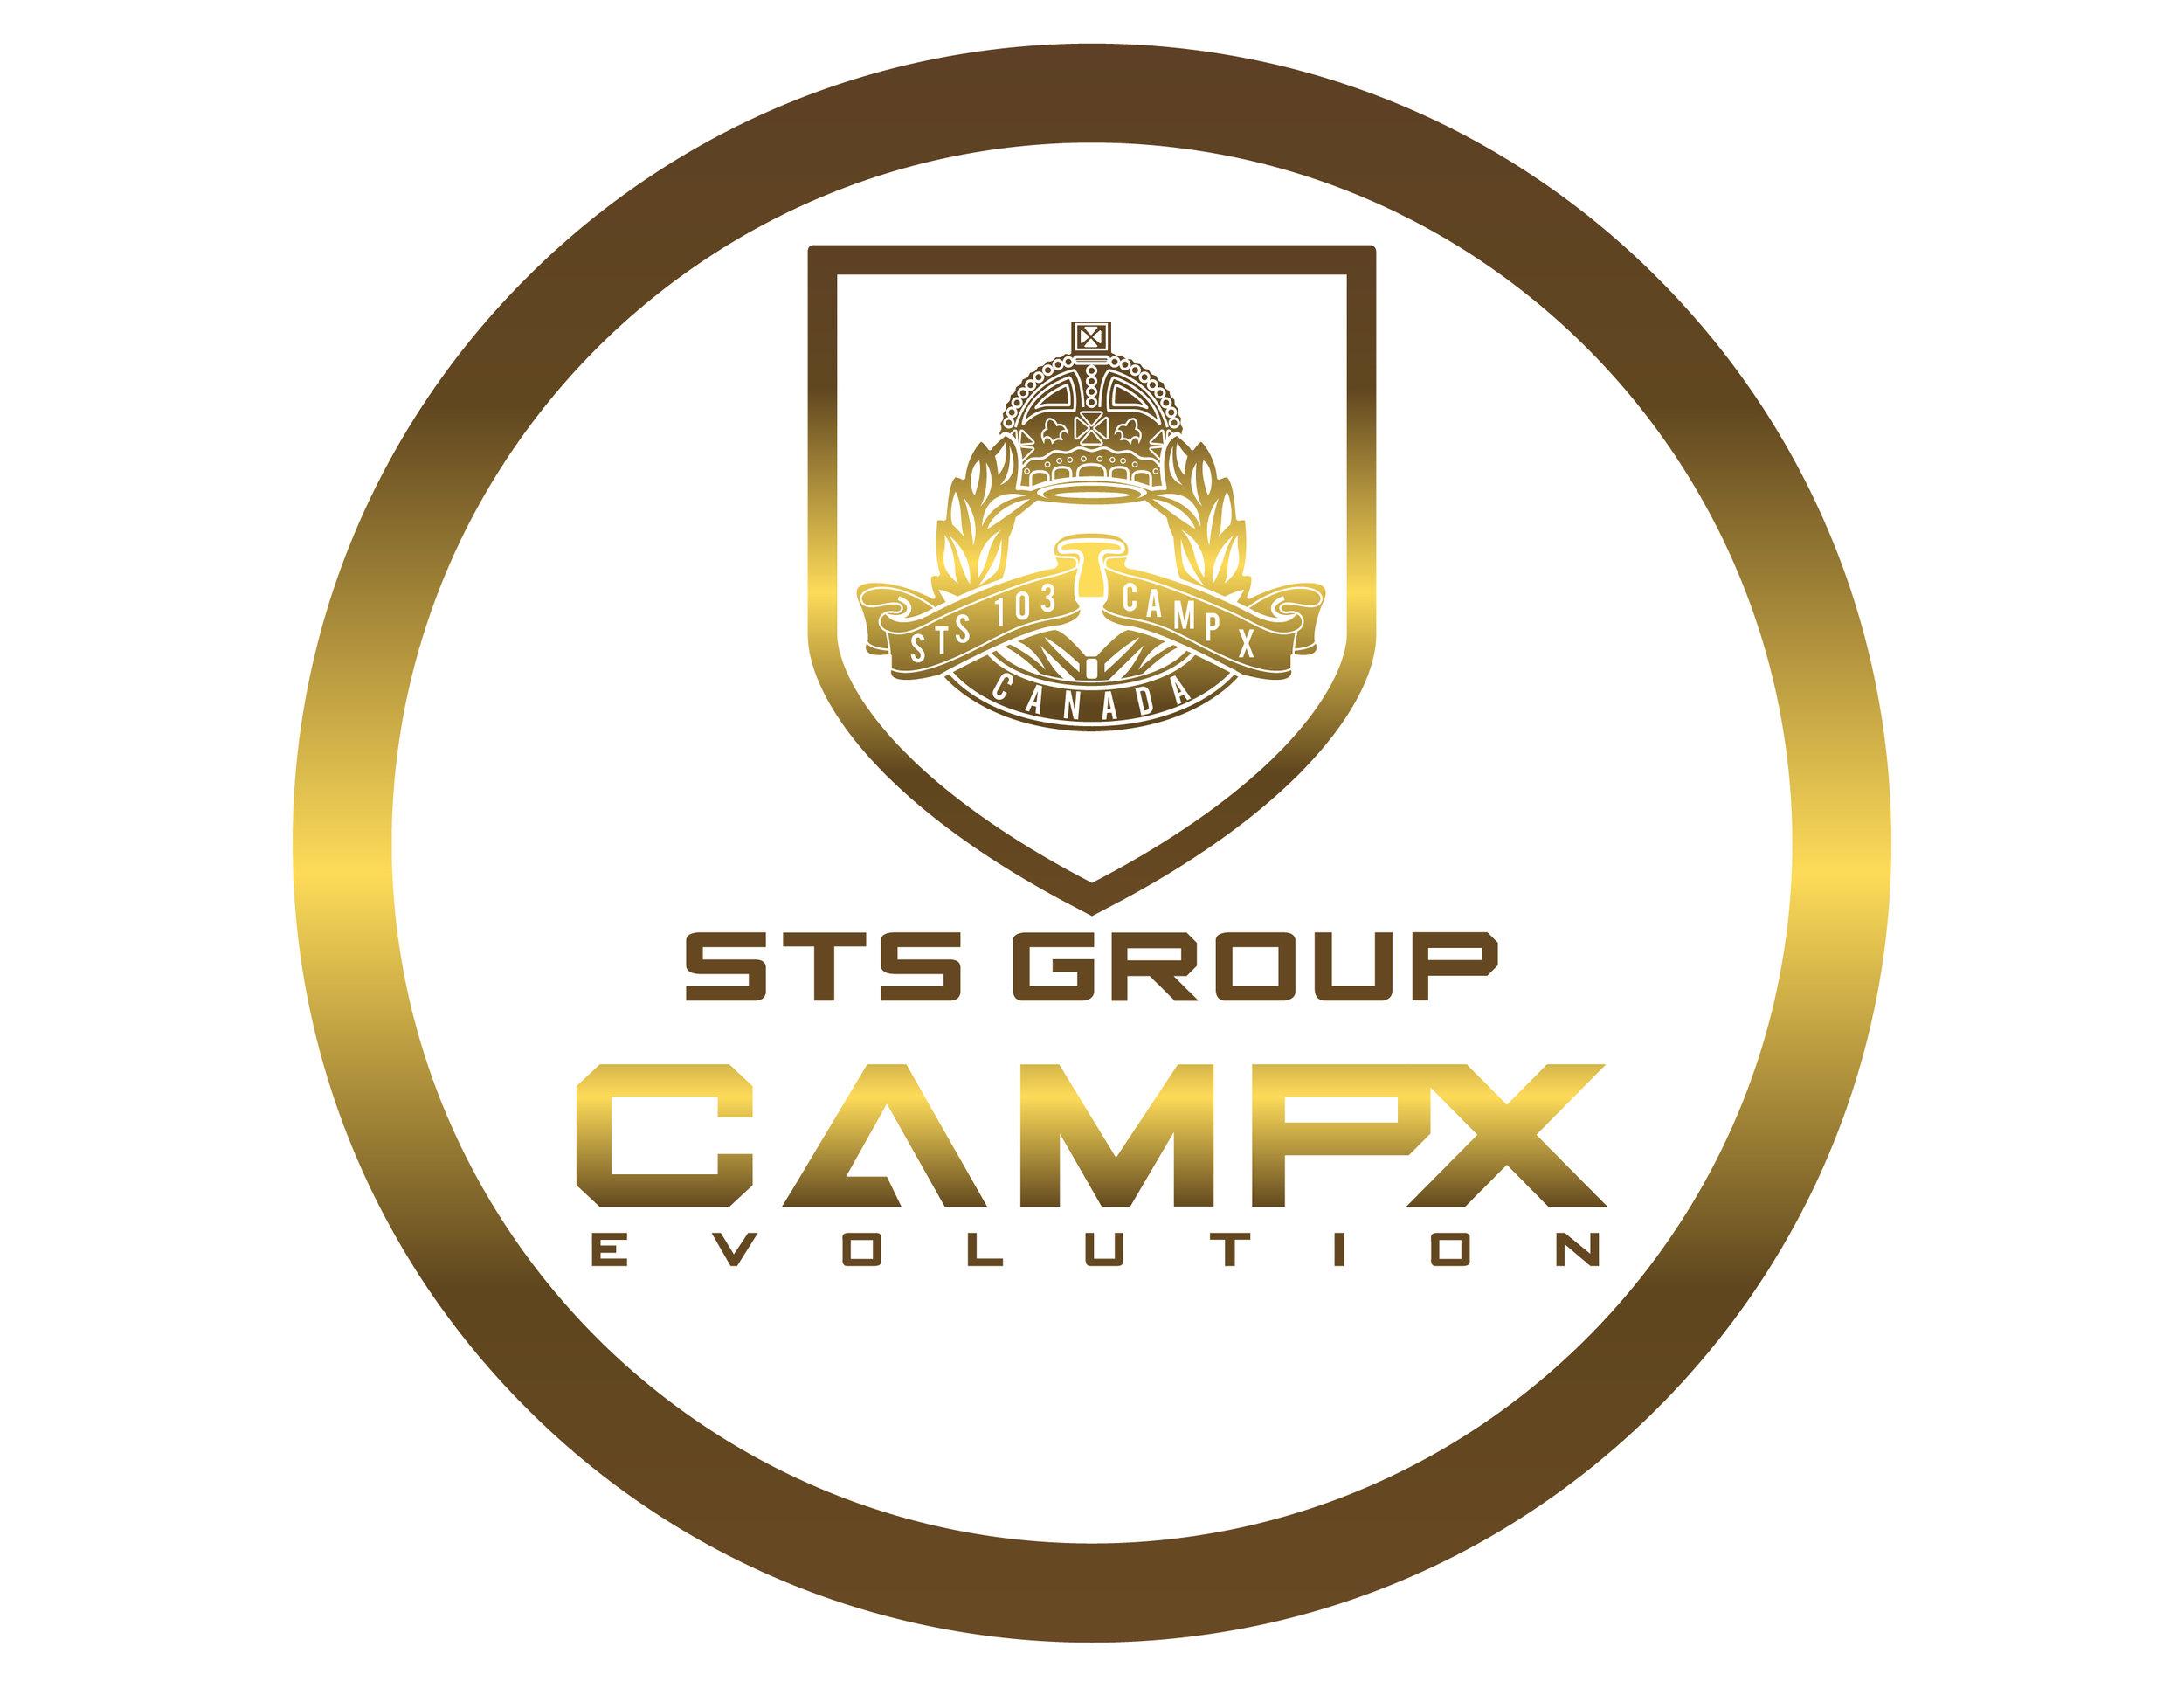 CampX_Evolution_LogoV3-01.jpg